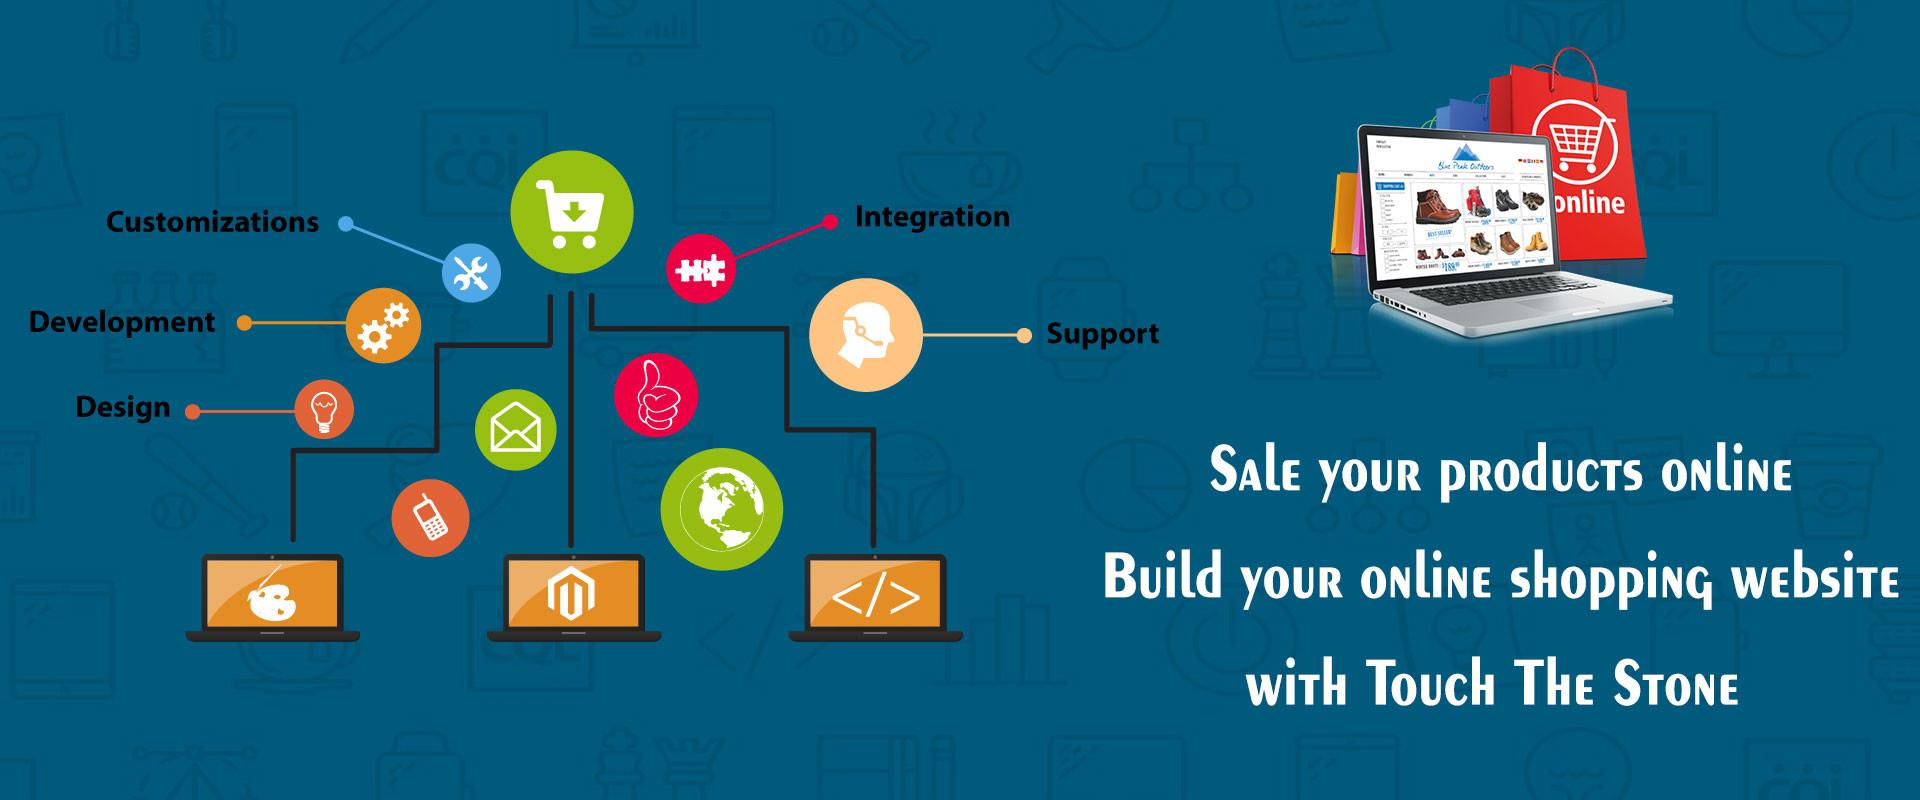 Best Digital Marketing Company Coimbatore India - Best Digital